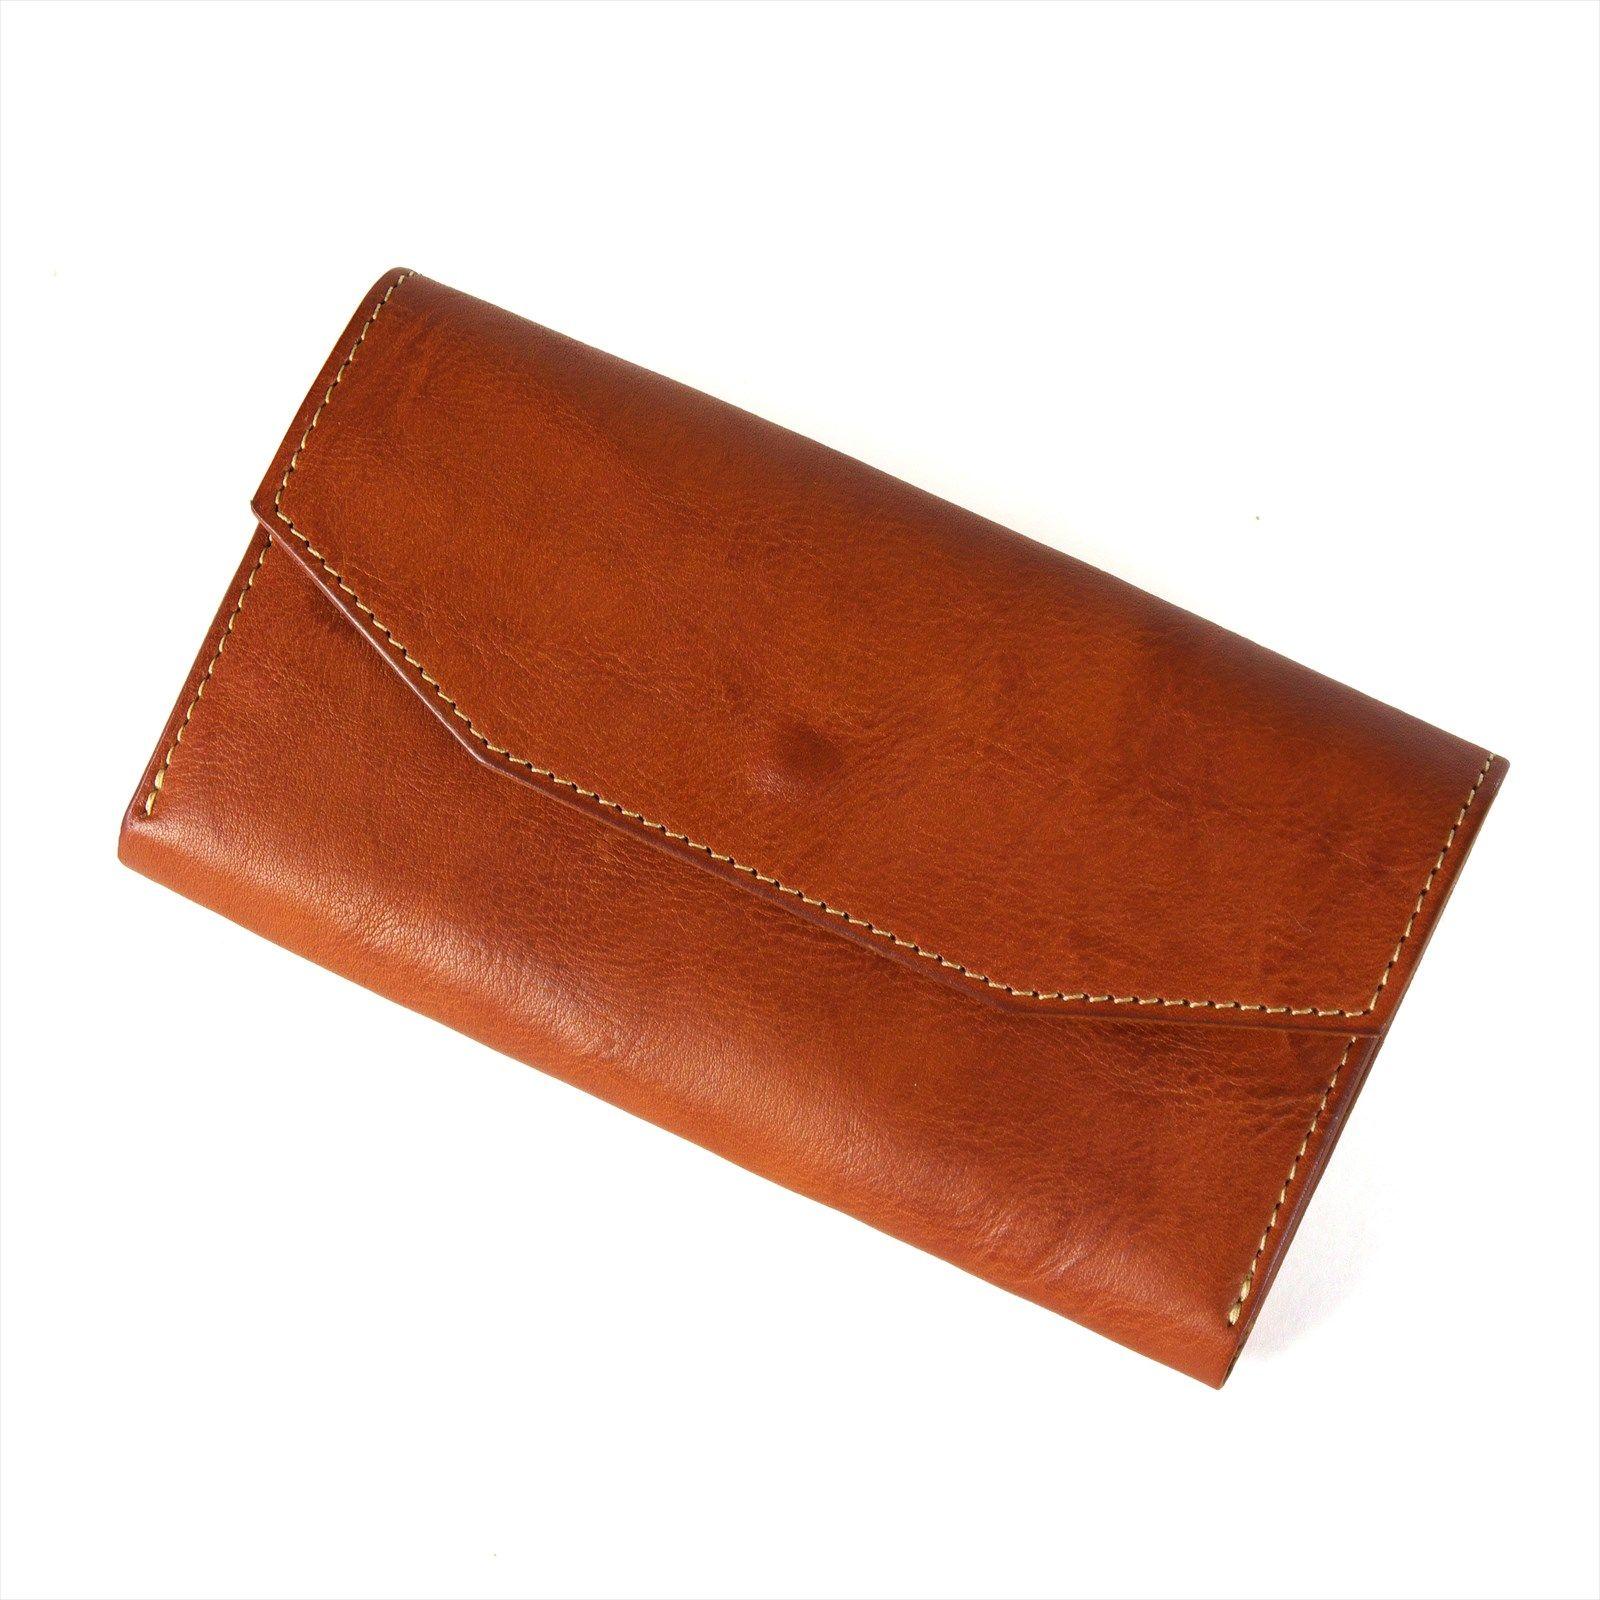 ANNAK ギャルソン型長財布 ベージュ AK14TA-B0039